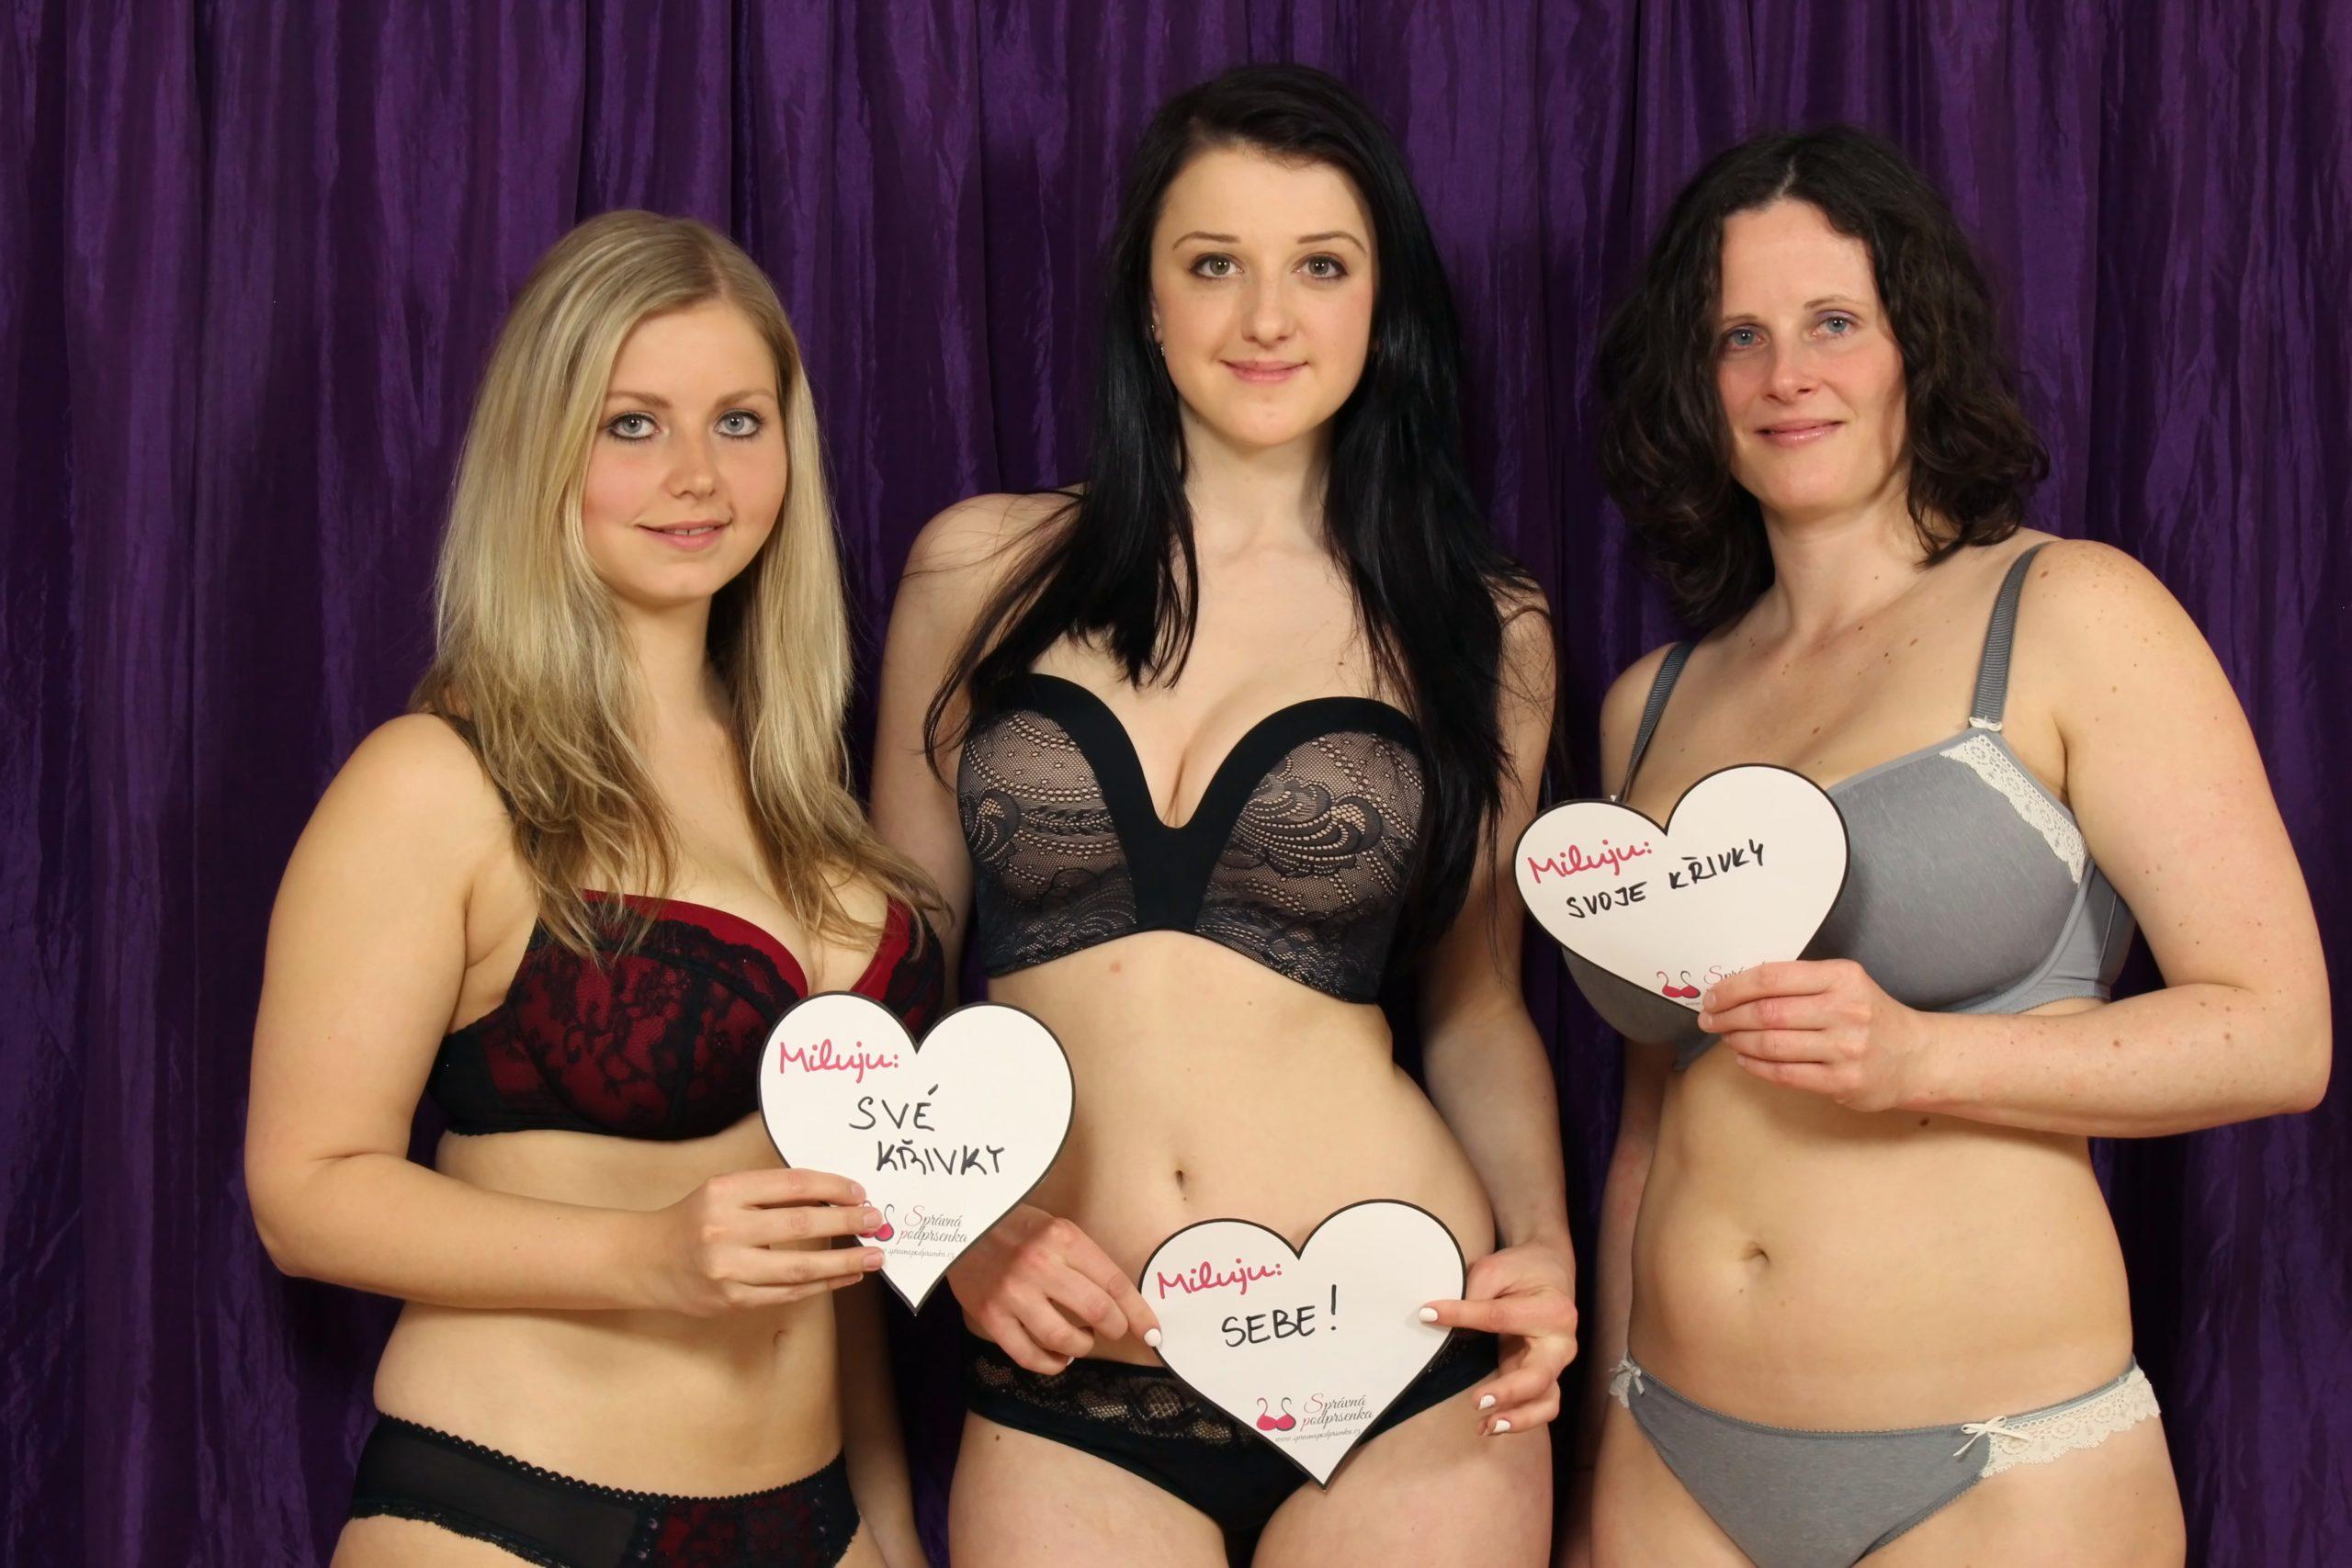 Kampaň The perfect body Správná podprsenka